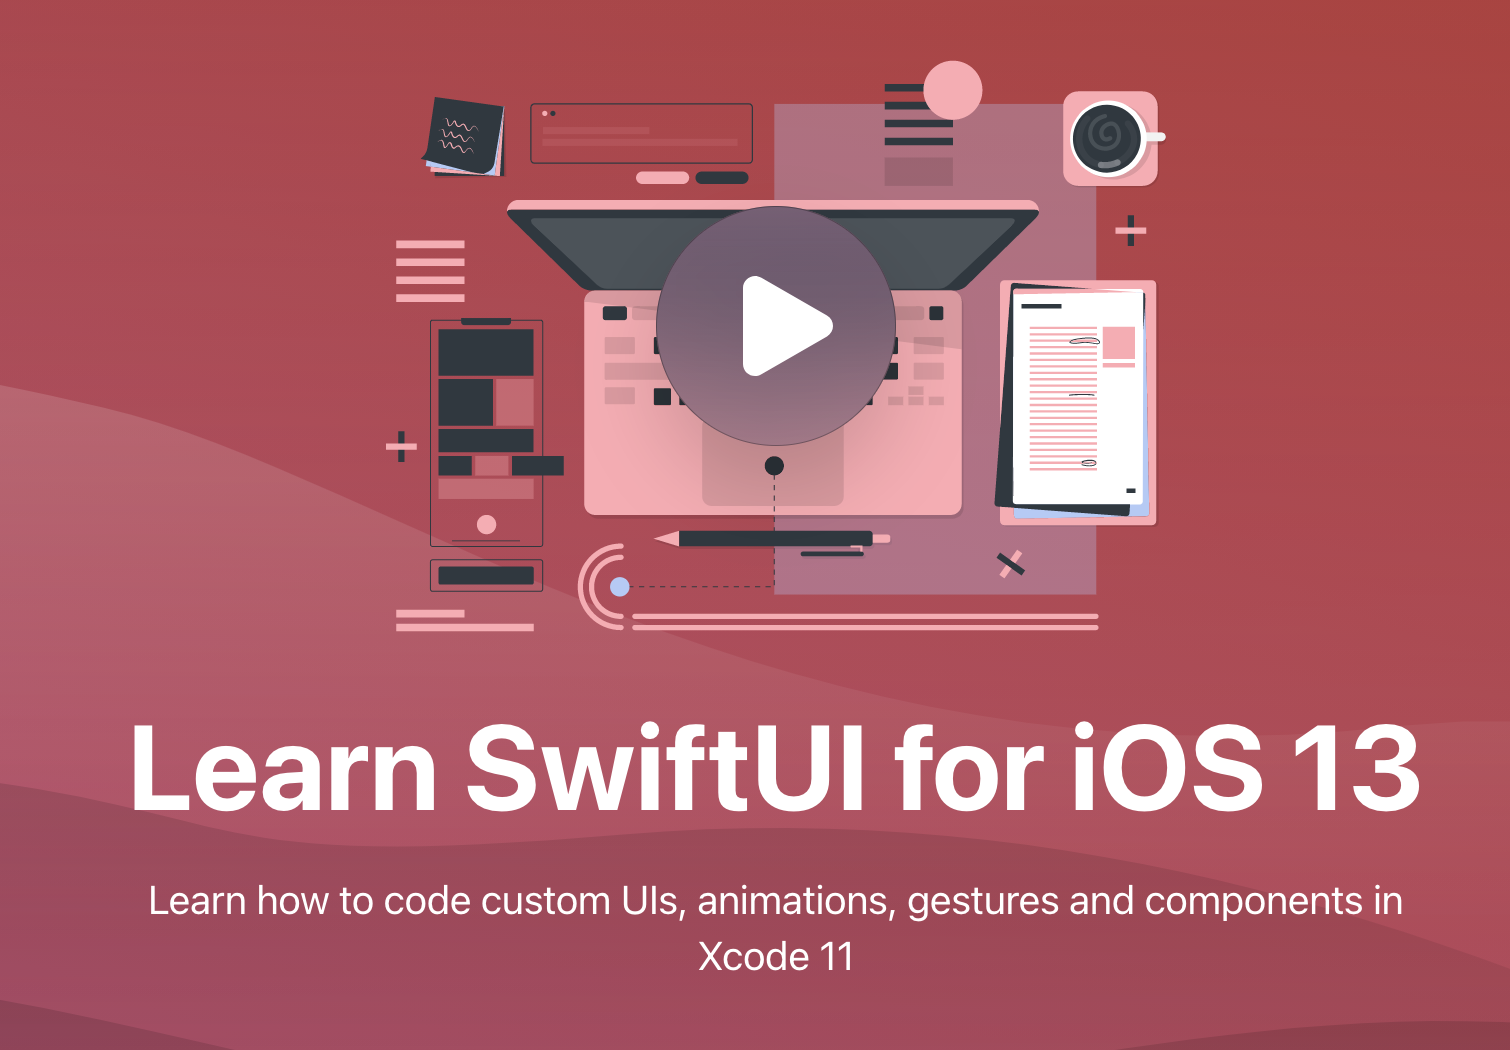 Learn SwiftUI course